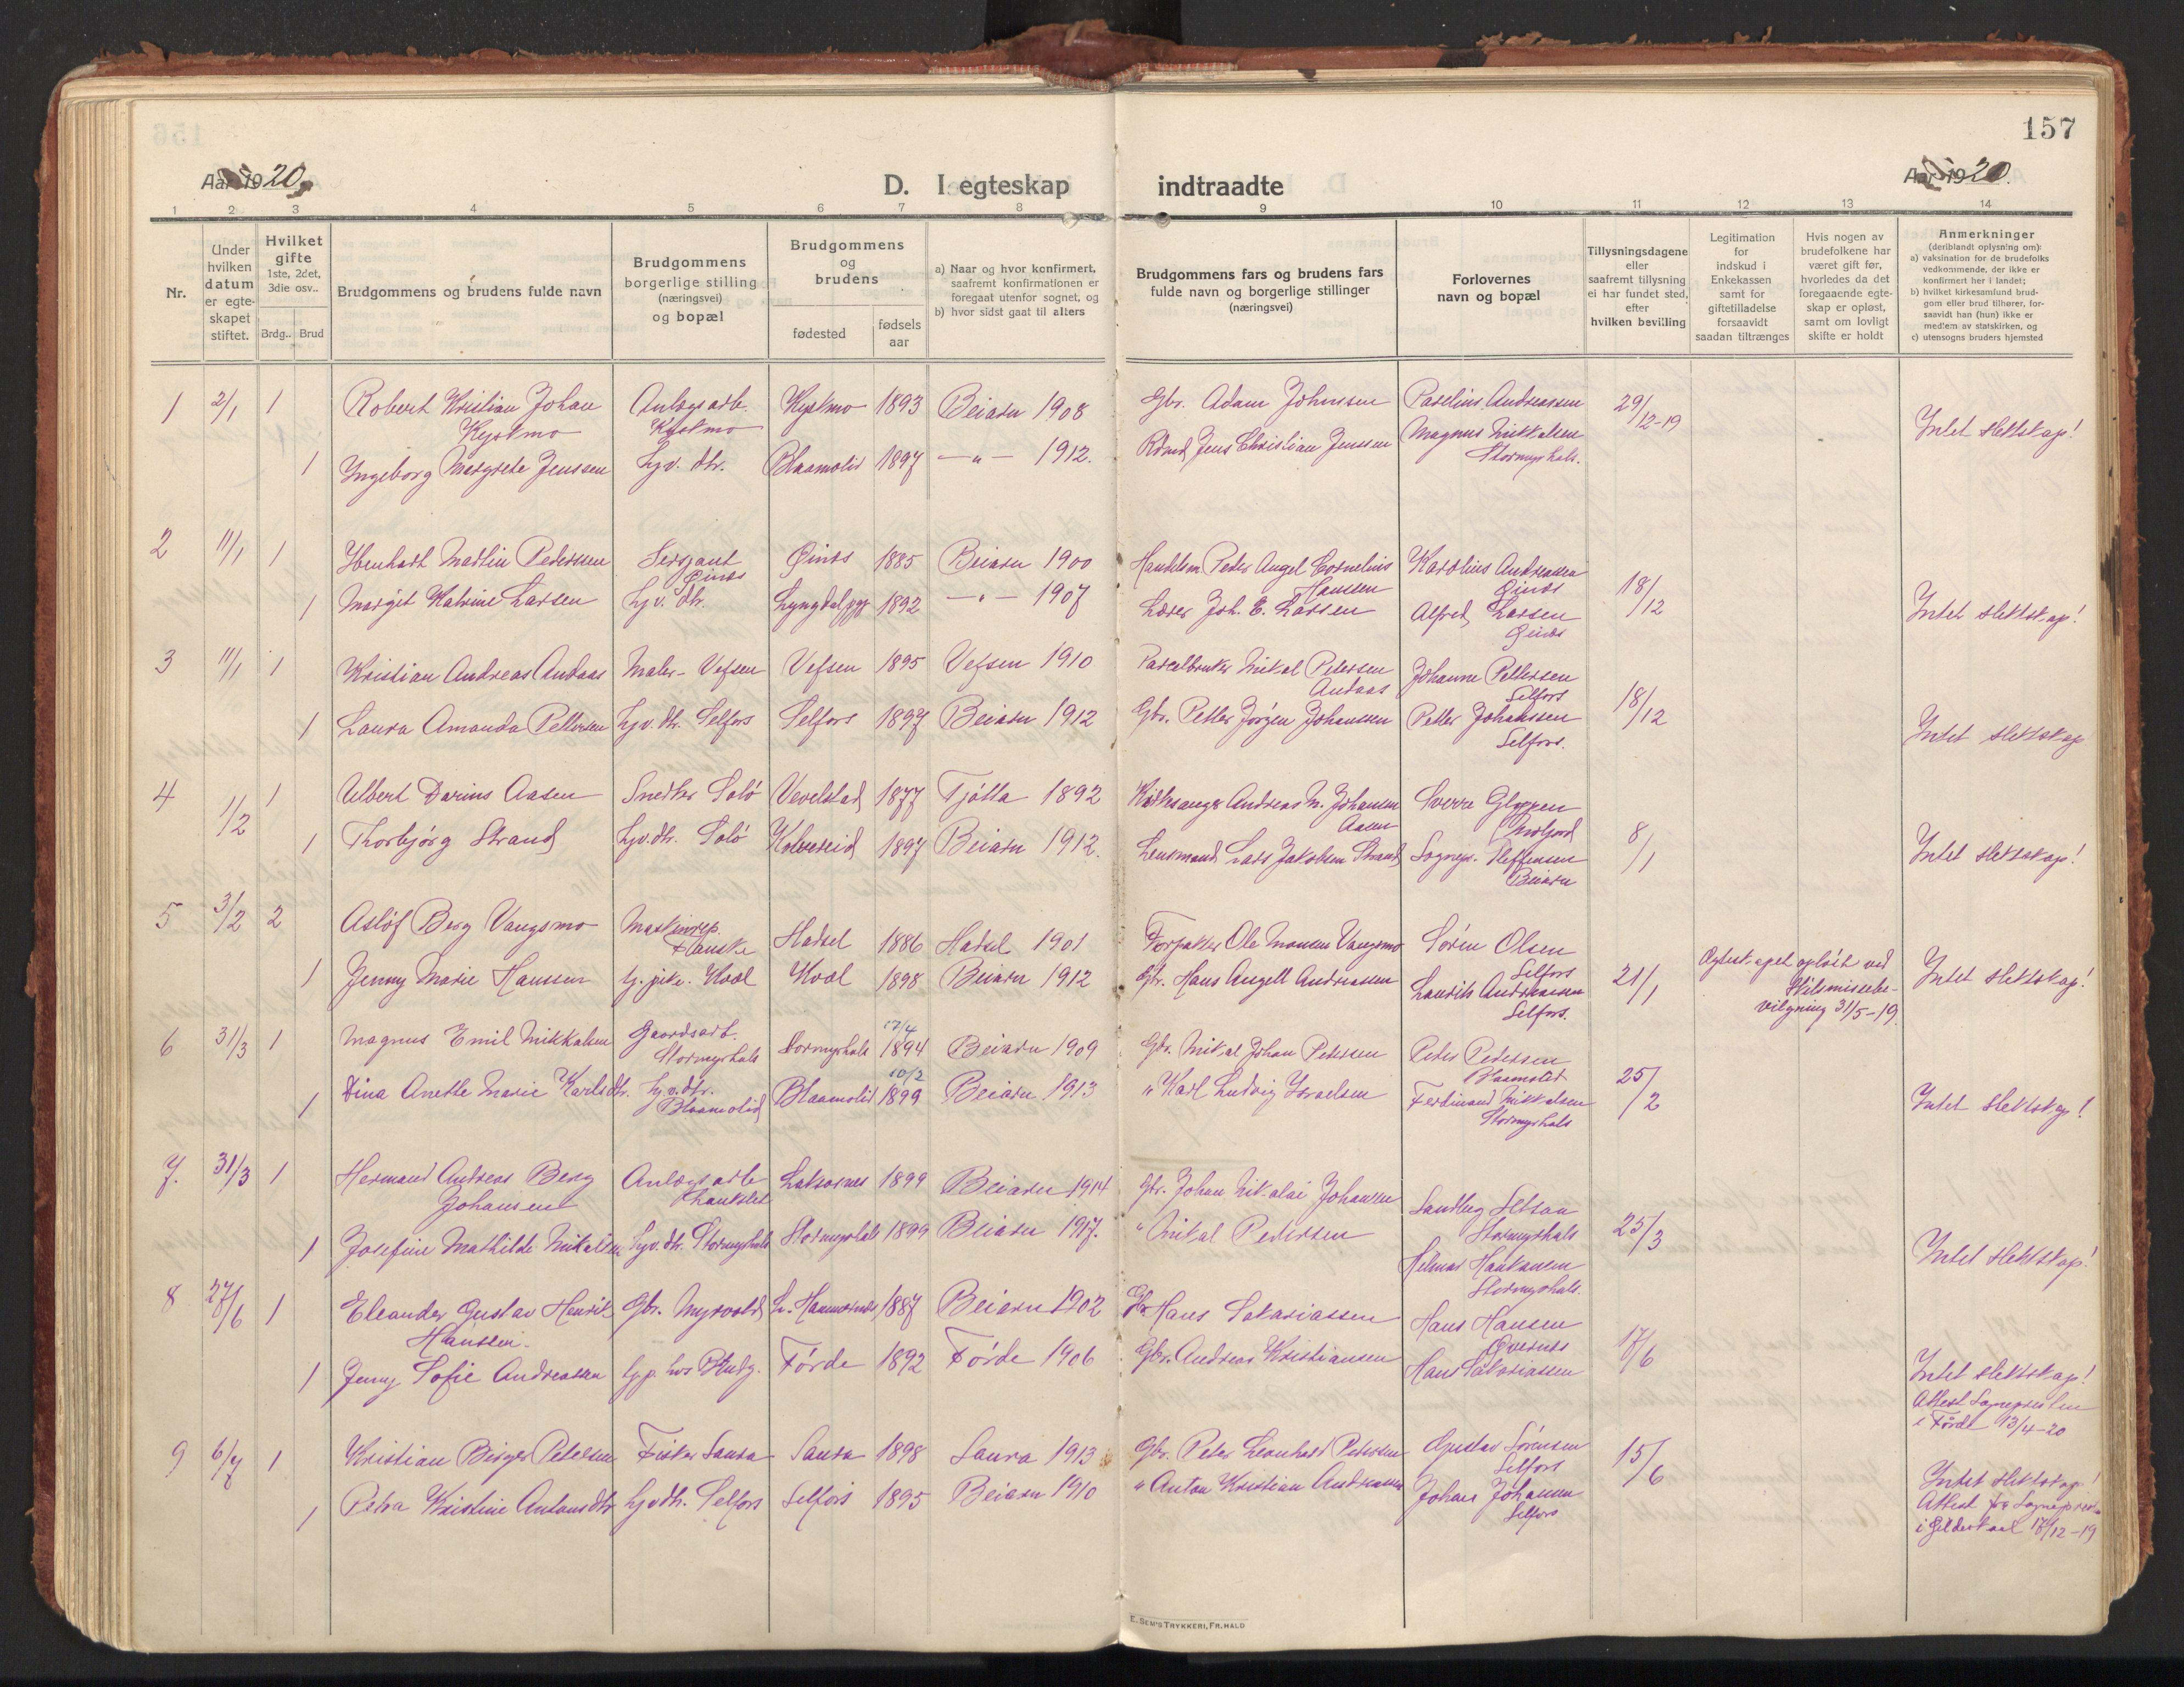 SAT, Ministerialprotokoller, klokkerbøker og fødselsregistre - Nordland, 846/L0650: Ministerialbok nr. 846A08, 1916-1935, s. 157